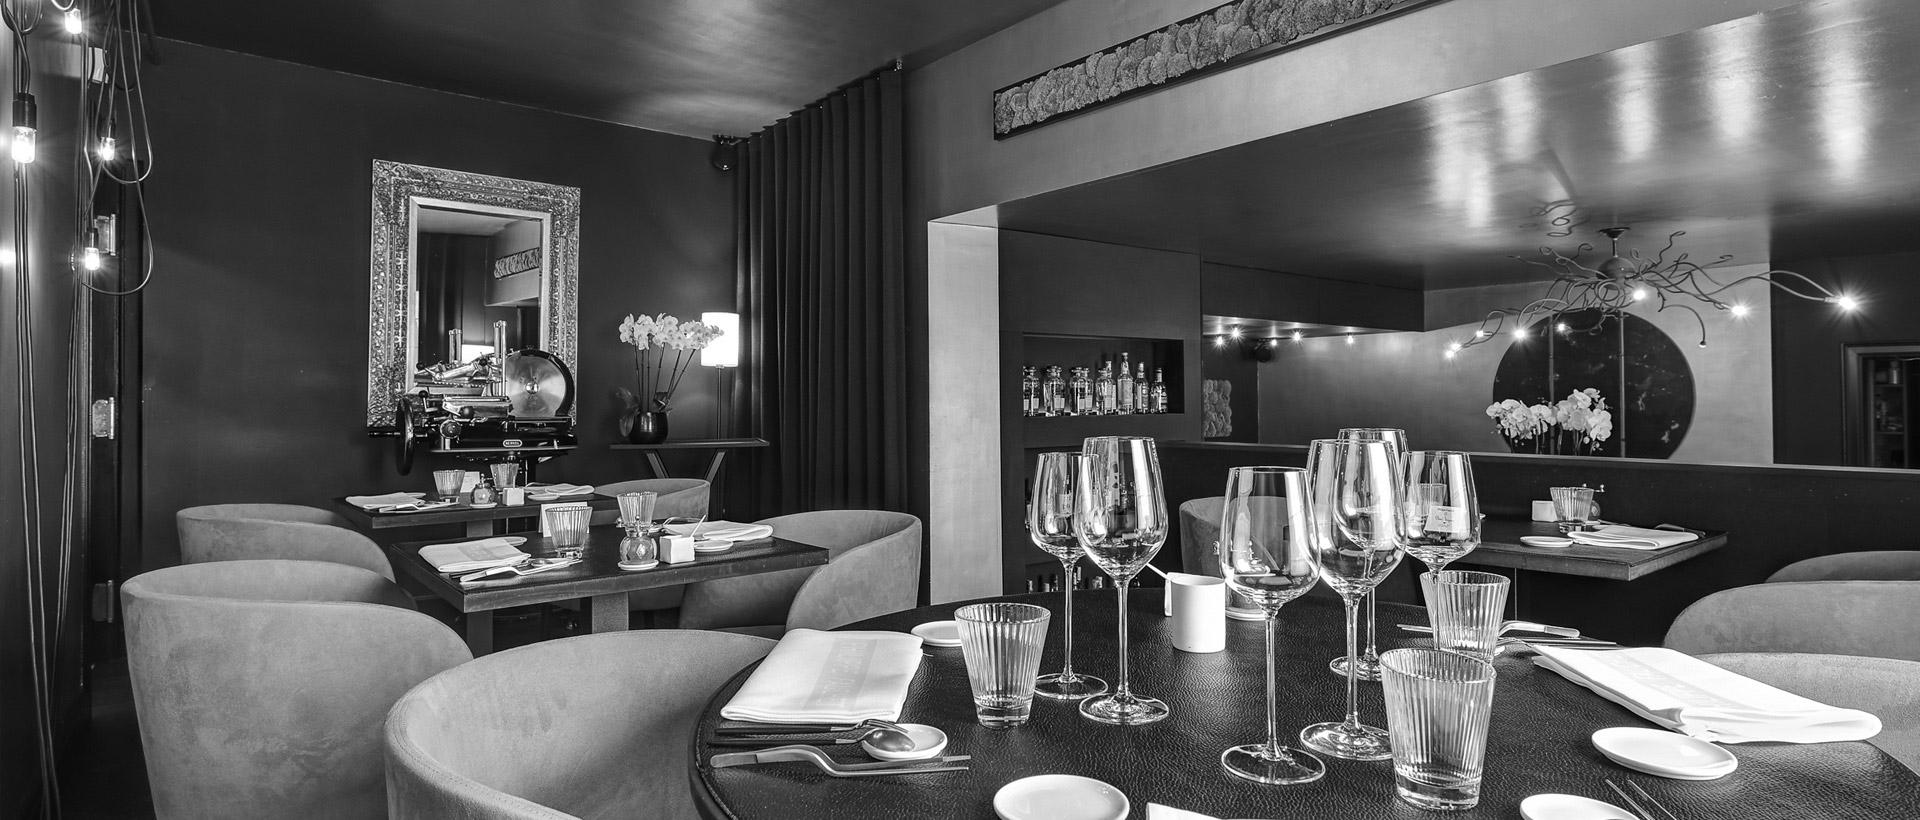 Philippe Fauchet - Restaurant